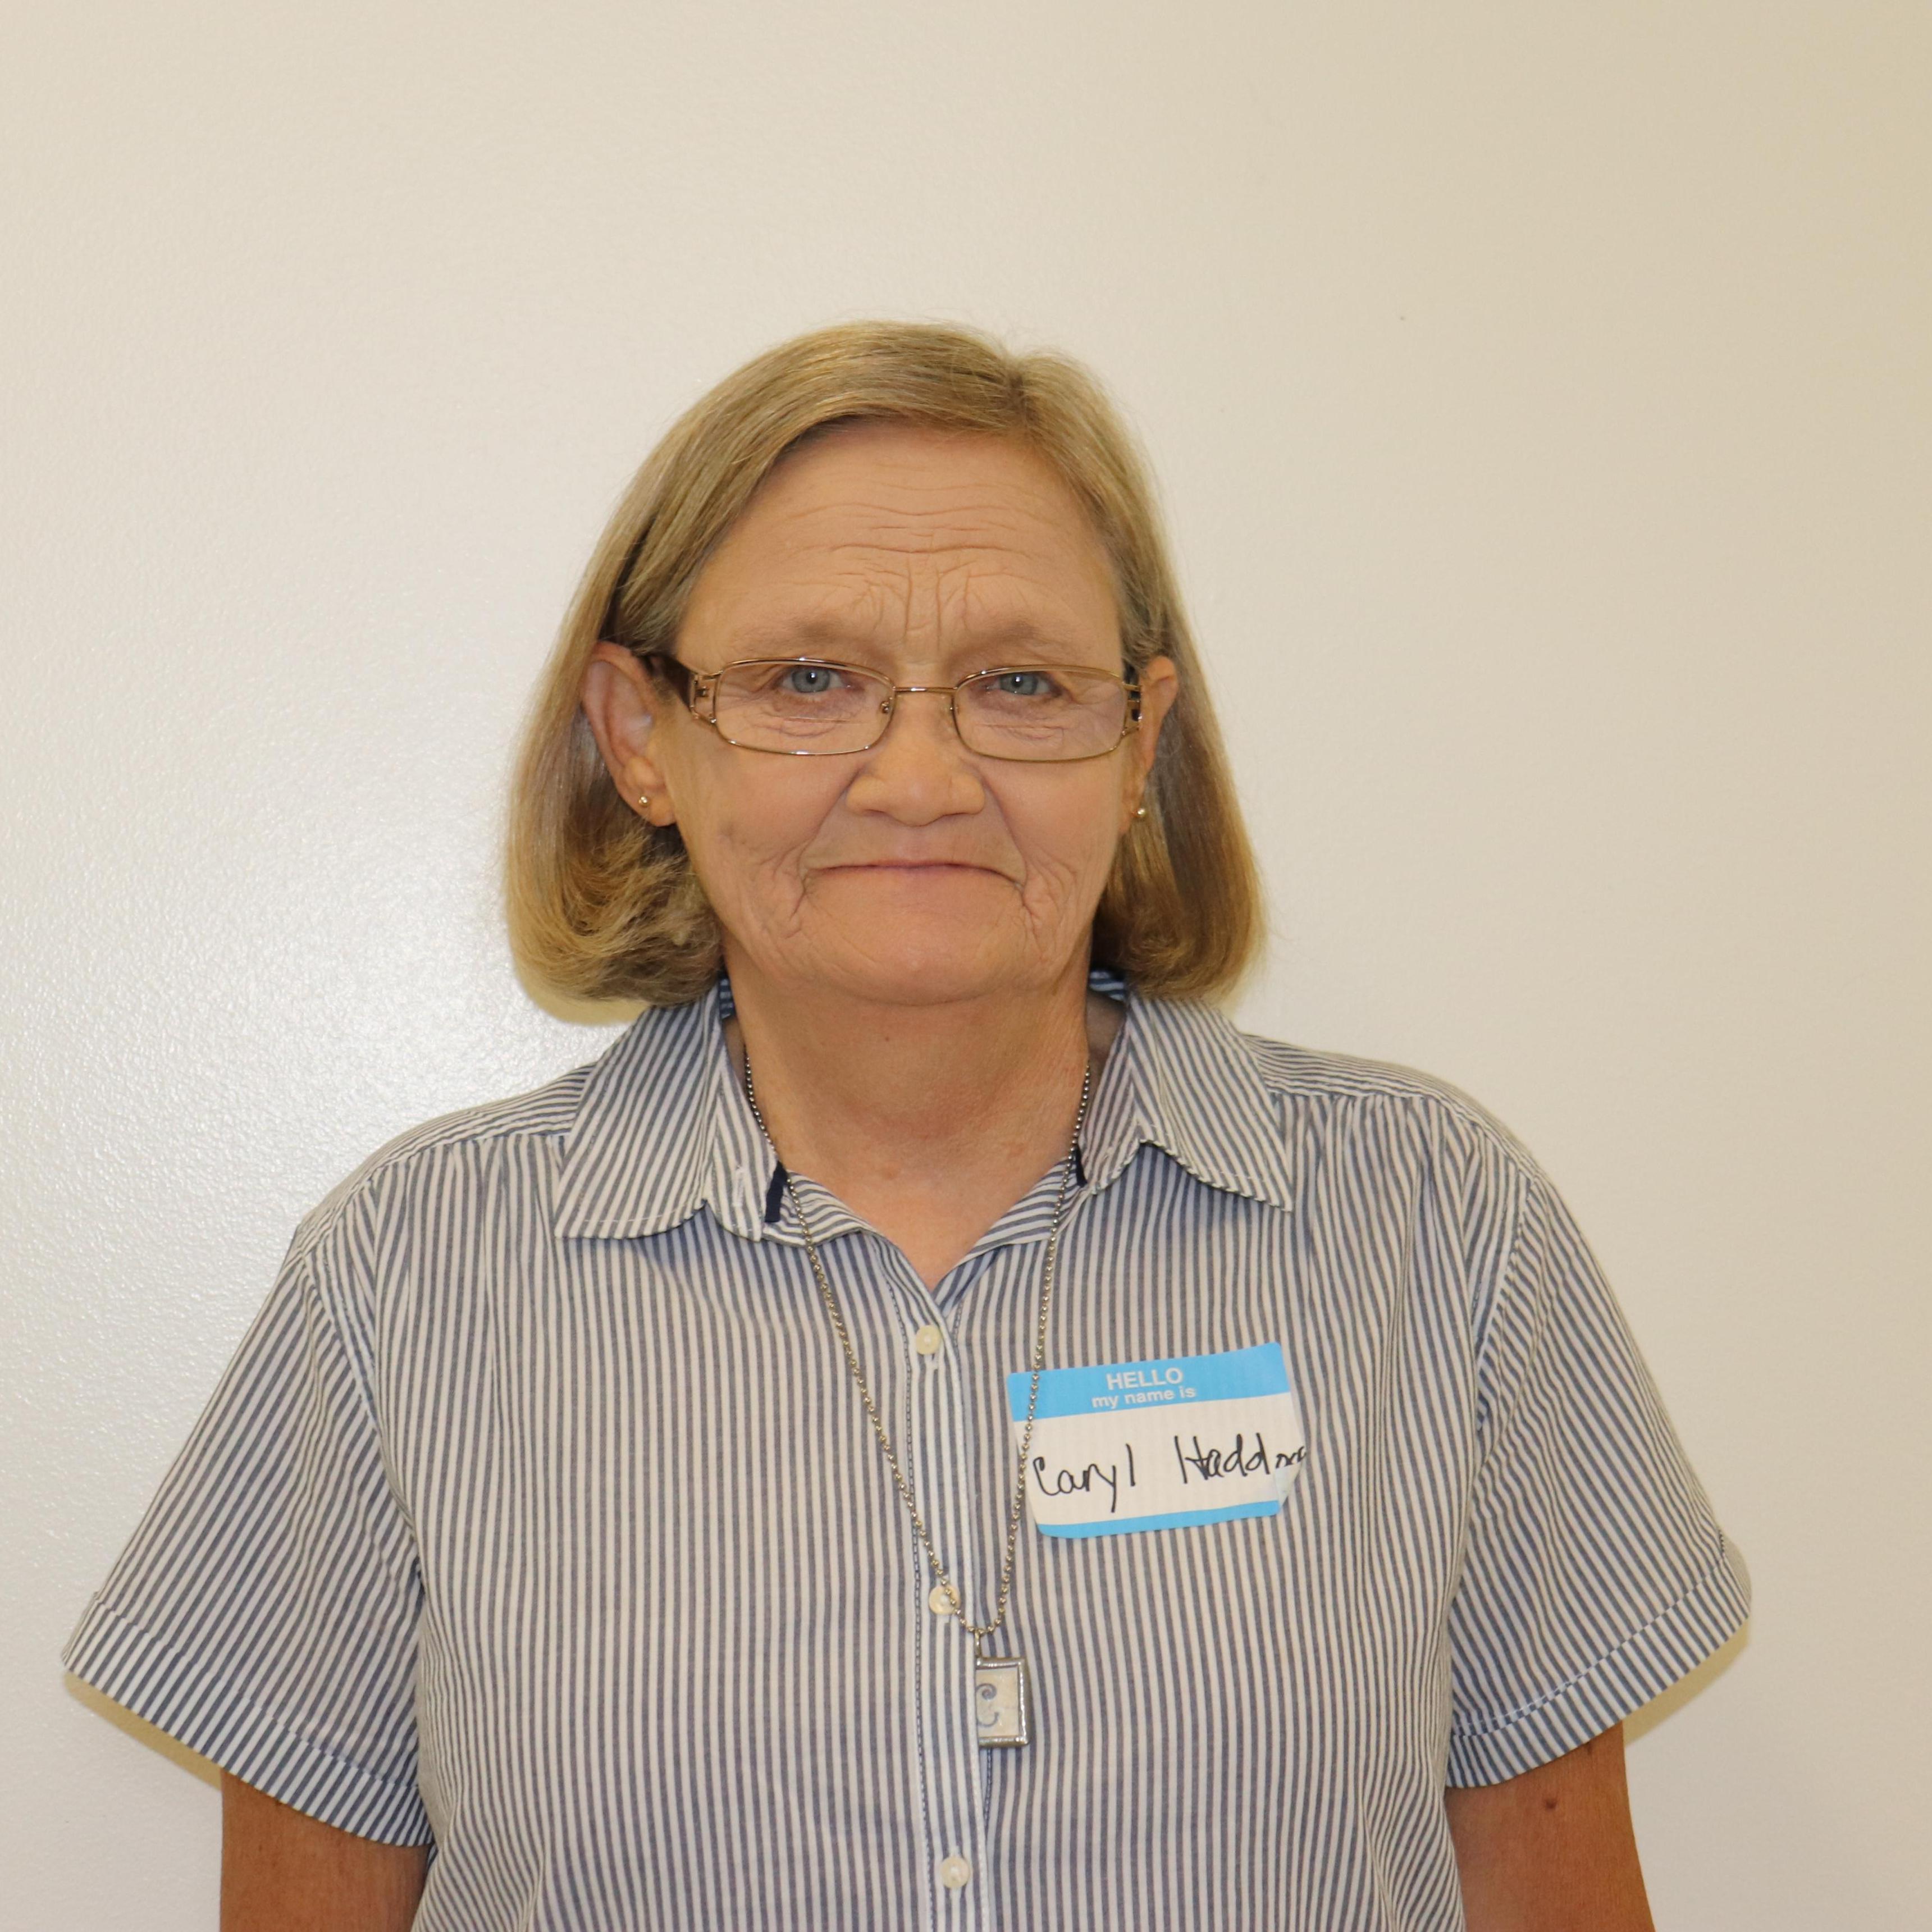 Caryl Haddock's Profile Photo